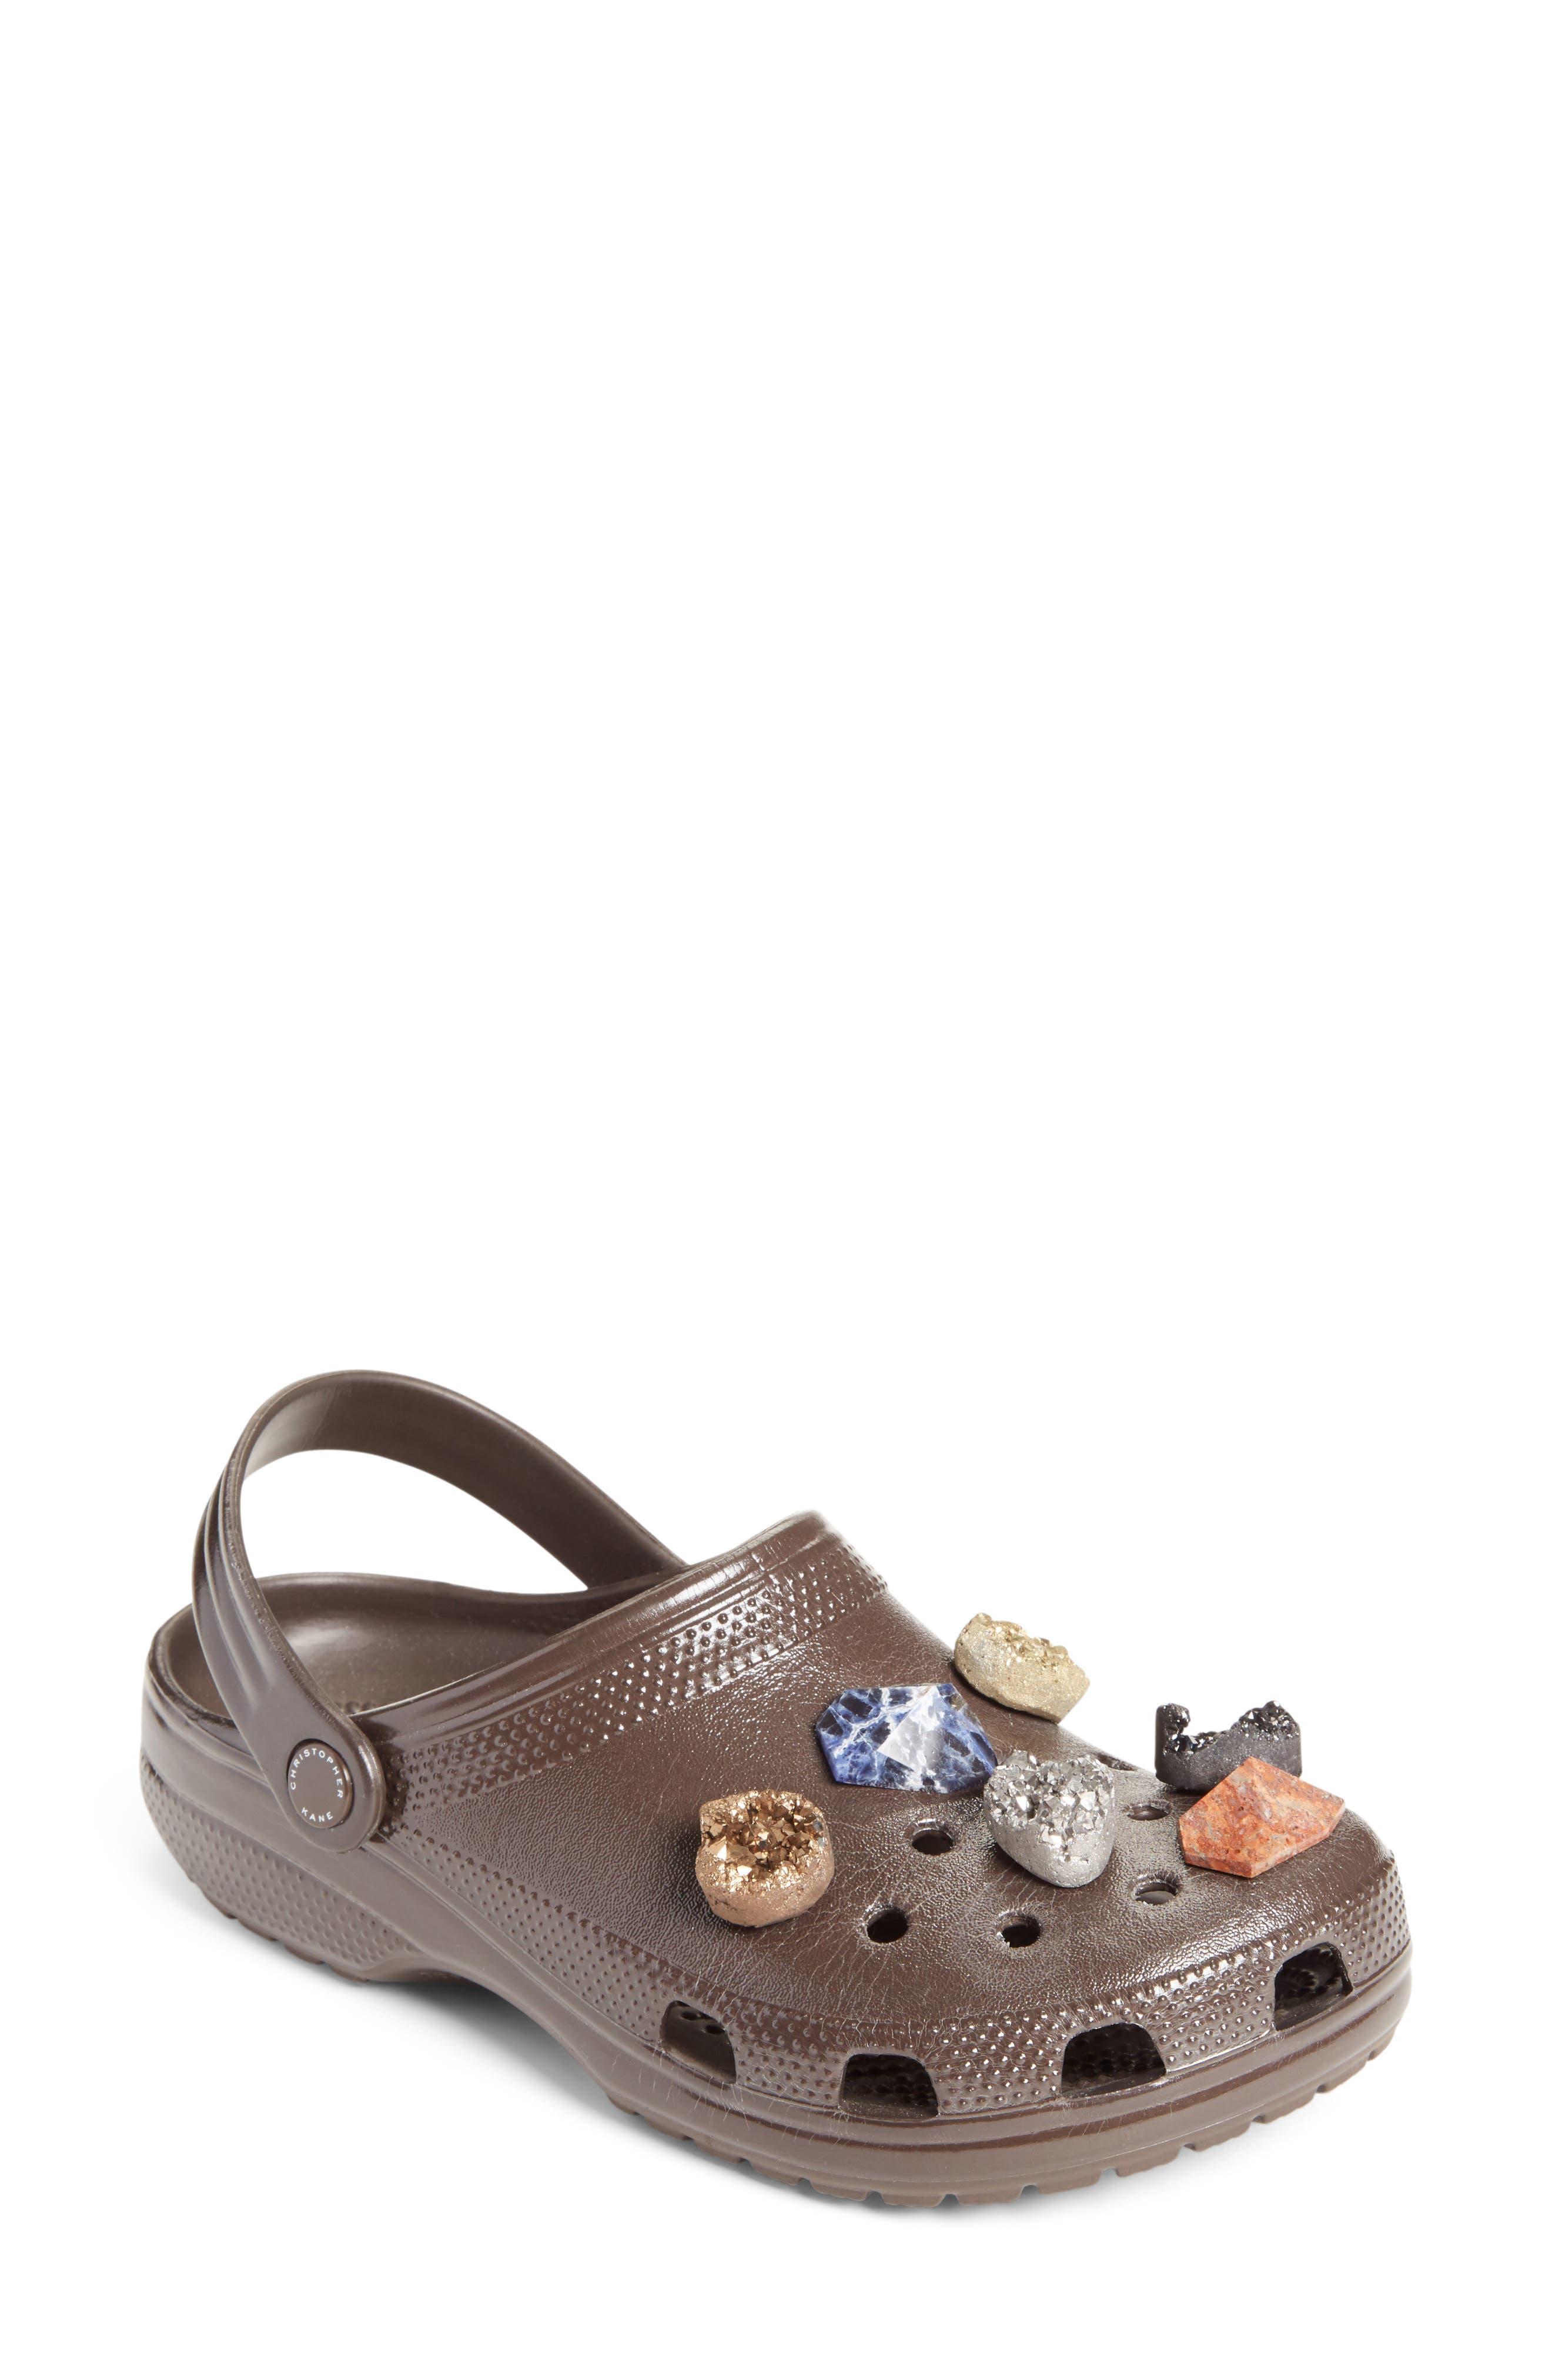 x CROCS<sup>™</sup> Multi Stone Clog Sandal,                             Main thumbnail 1, color,                             200